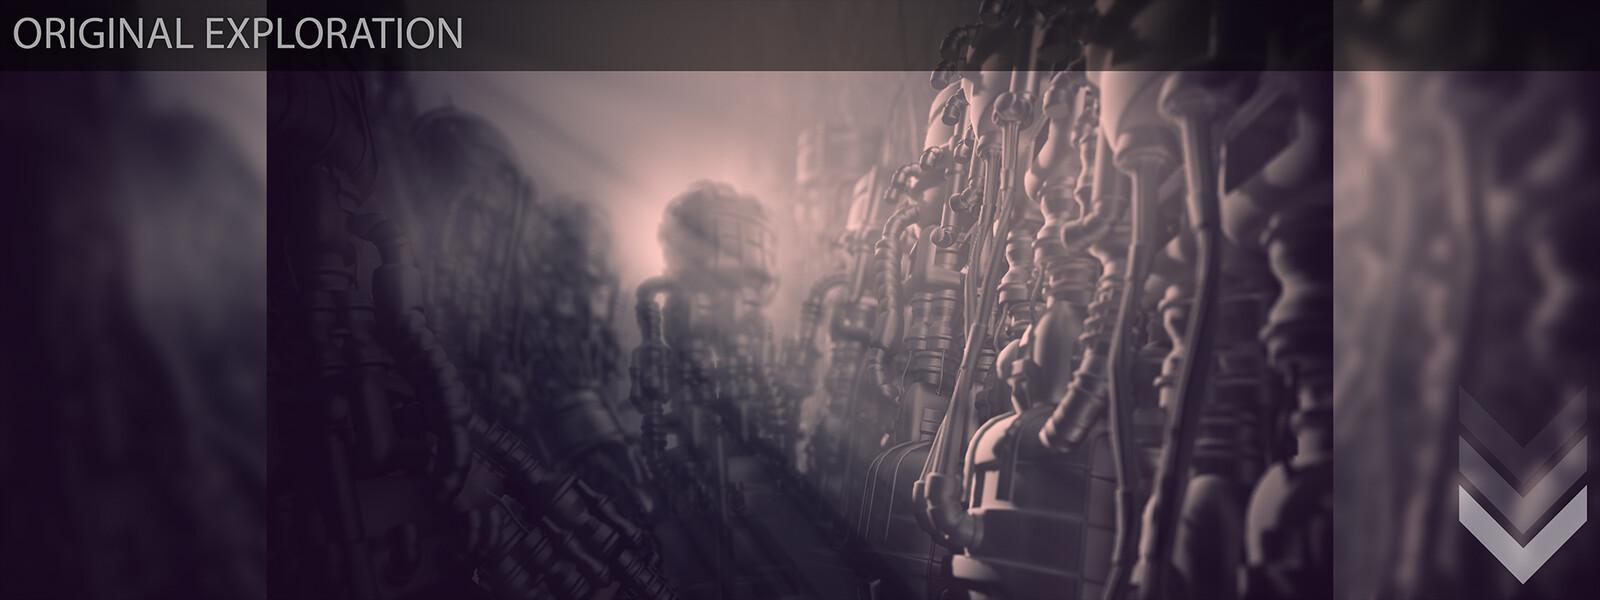 Amaru - Progression shots from original exploration to near final composition/lighting. 1 of 4